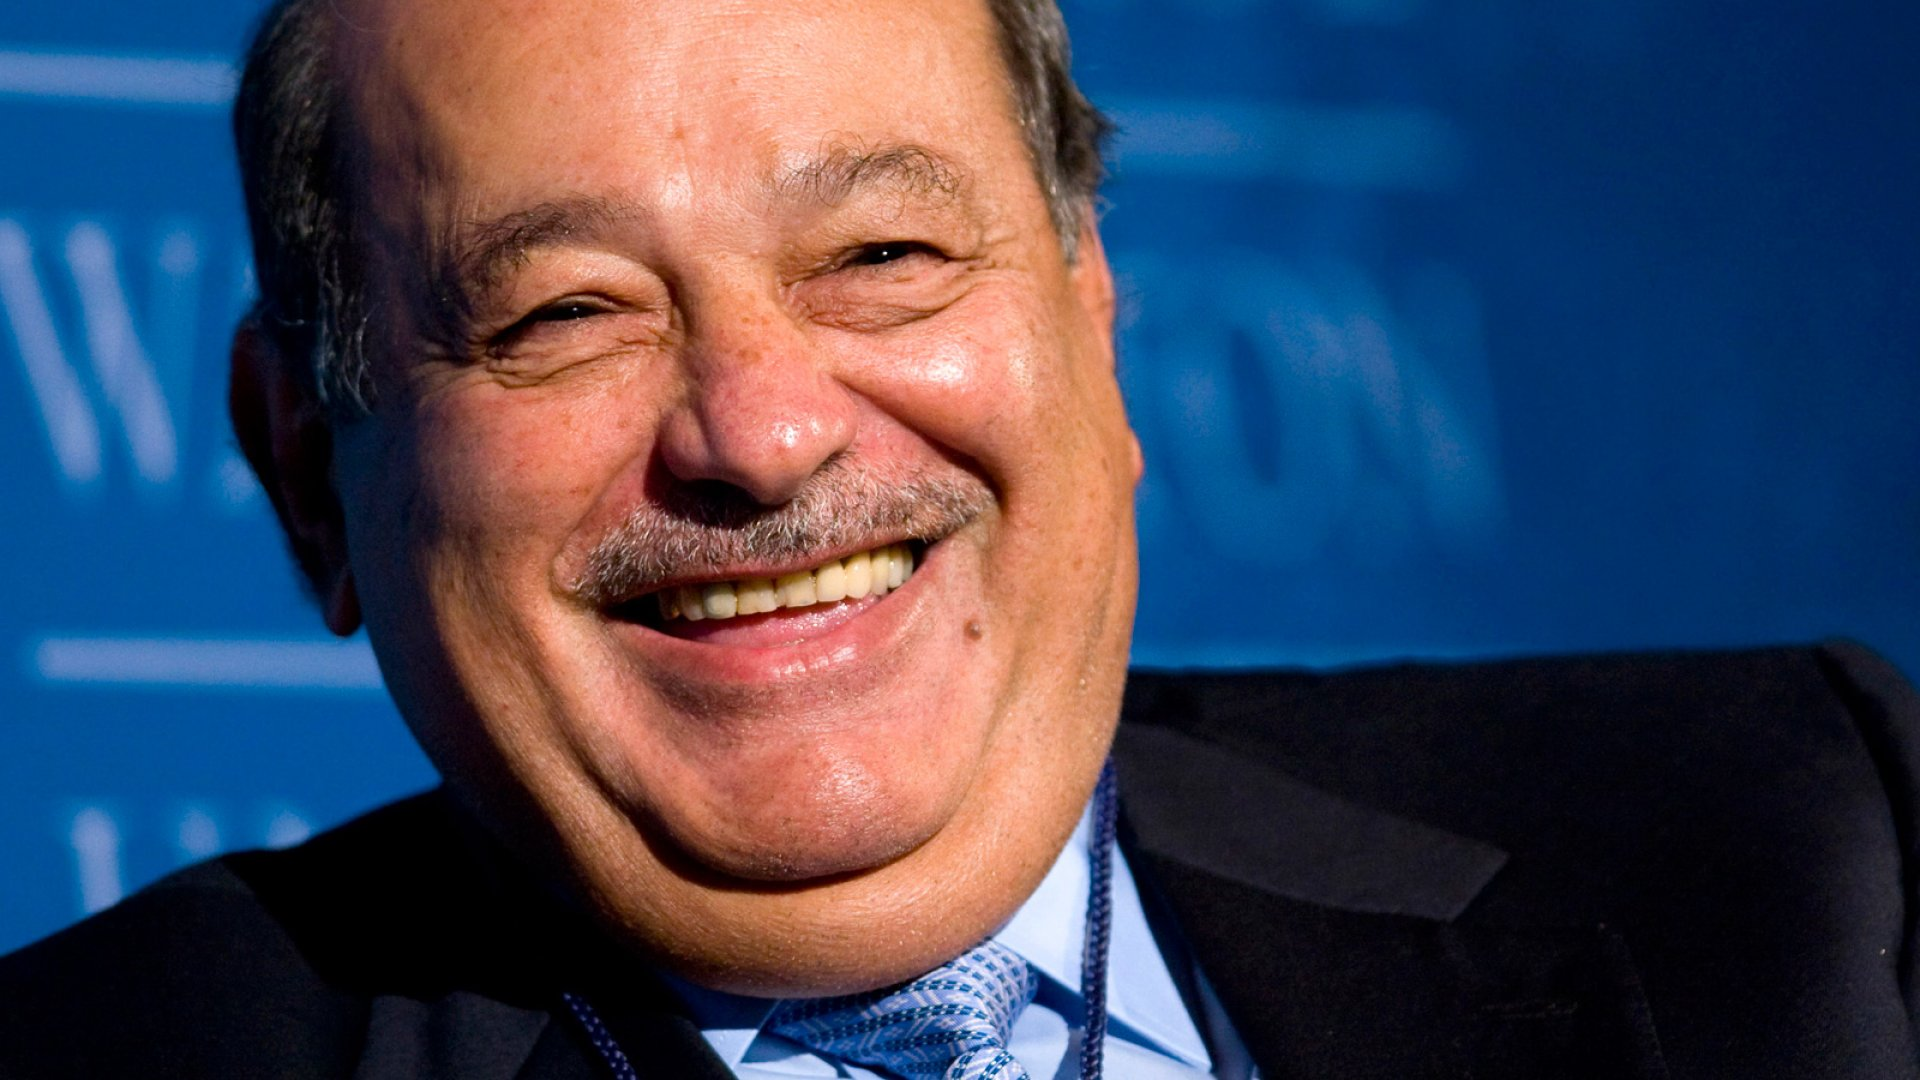 Carlos Slim Says You're Working Too Hard